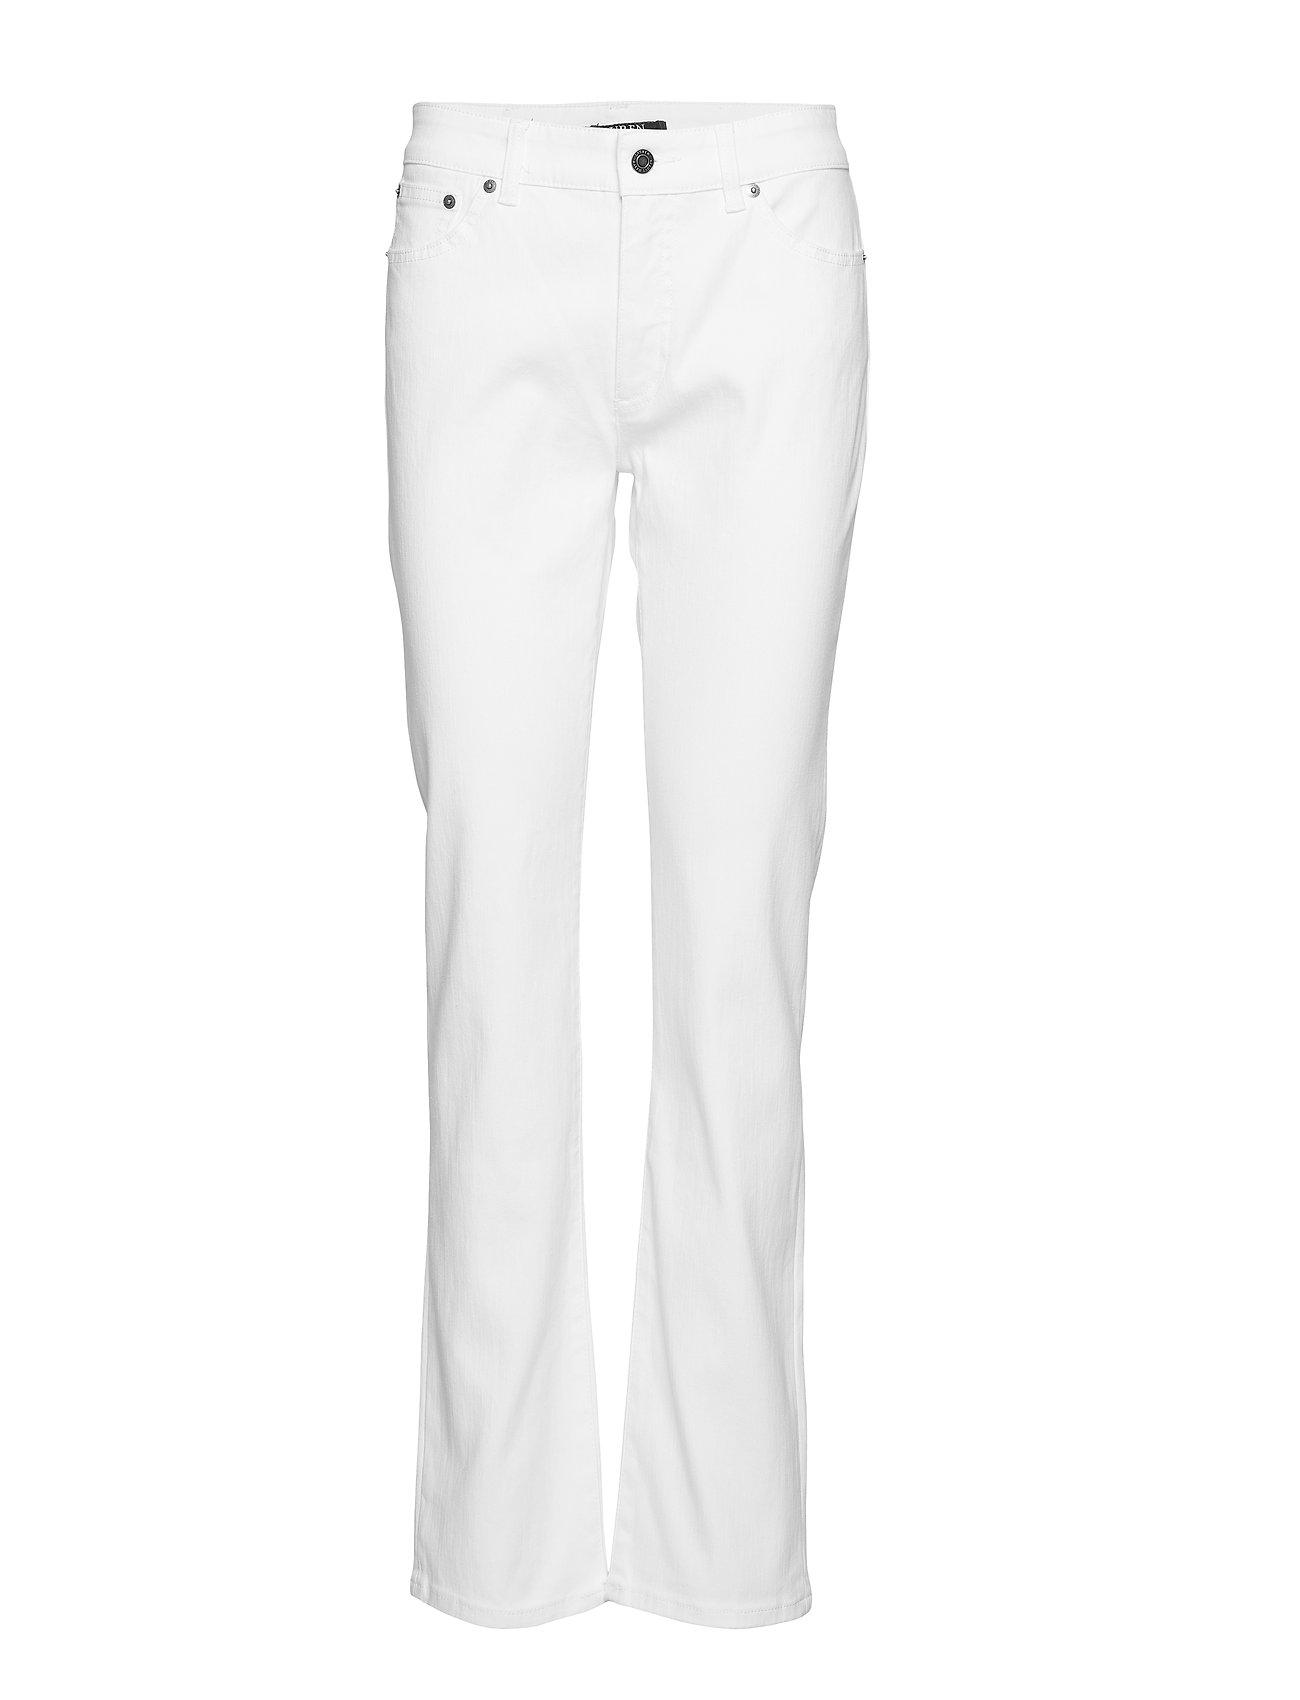 Lauren Ralph Lauren Slimming Premier Straight Jean - WHITE